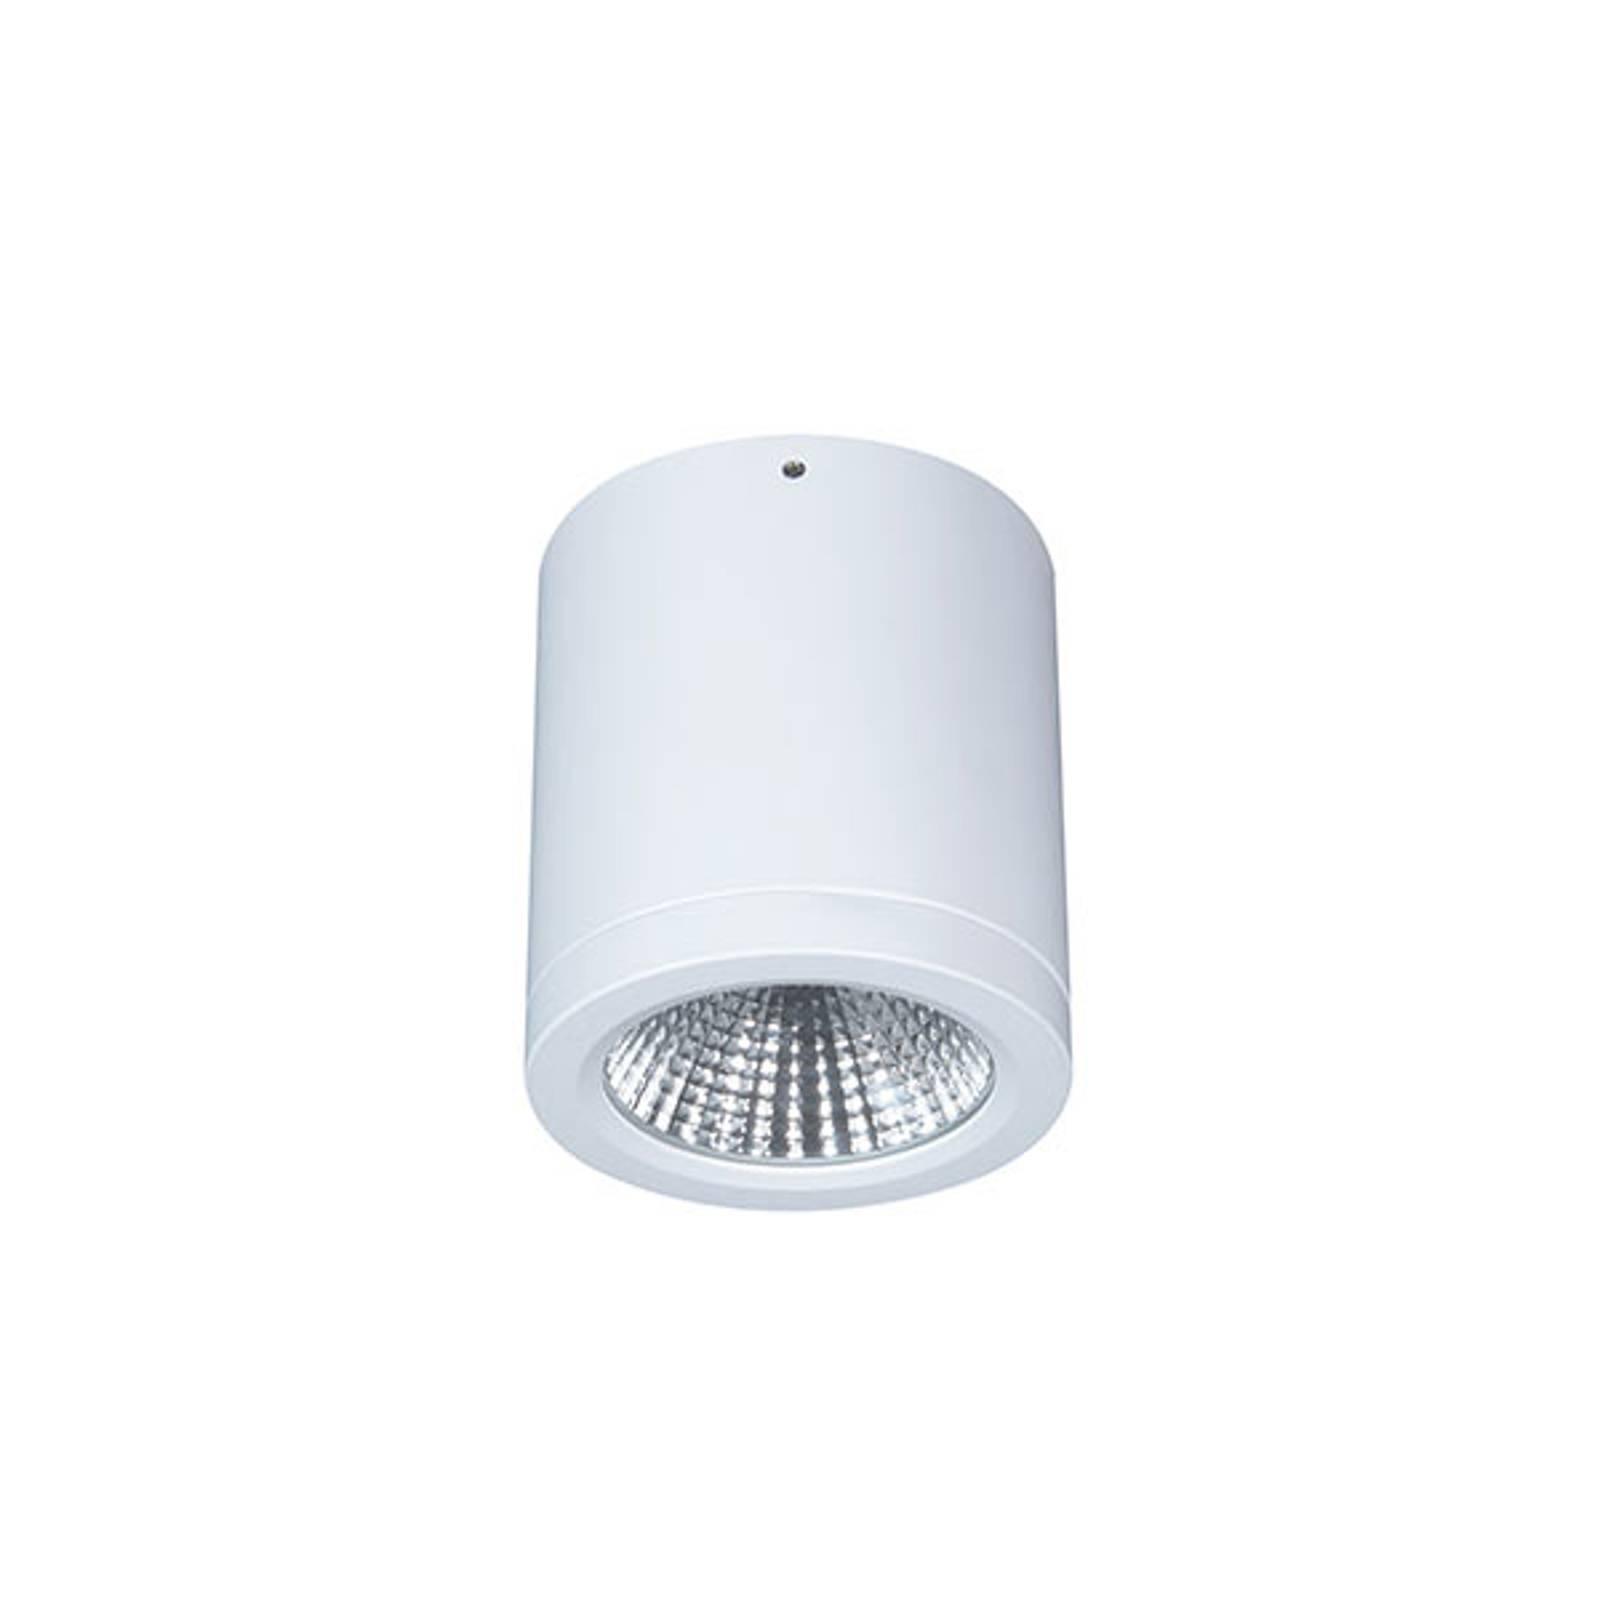 Downlight LED Button Mini 100 IP54 55° 16 W